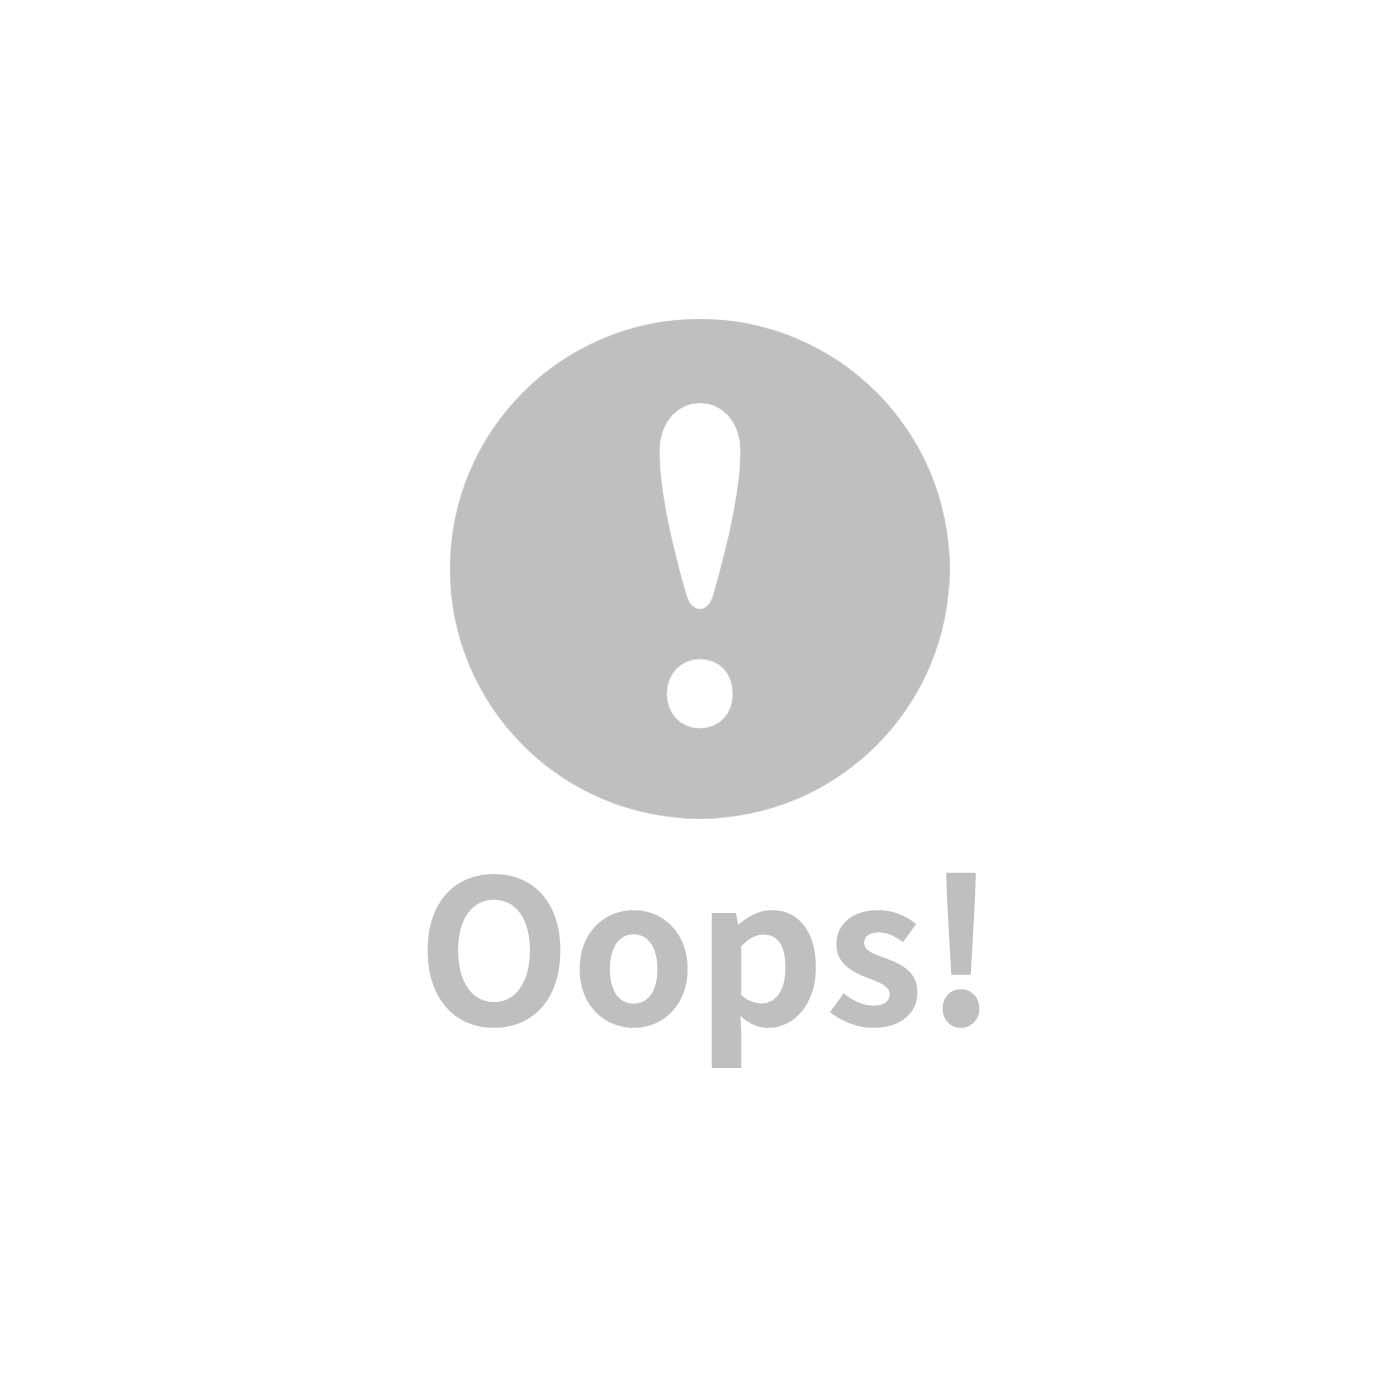 global affairs 童話手工編織安撫搖鈴_林地系列(小蜜獾)